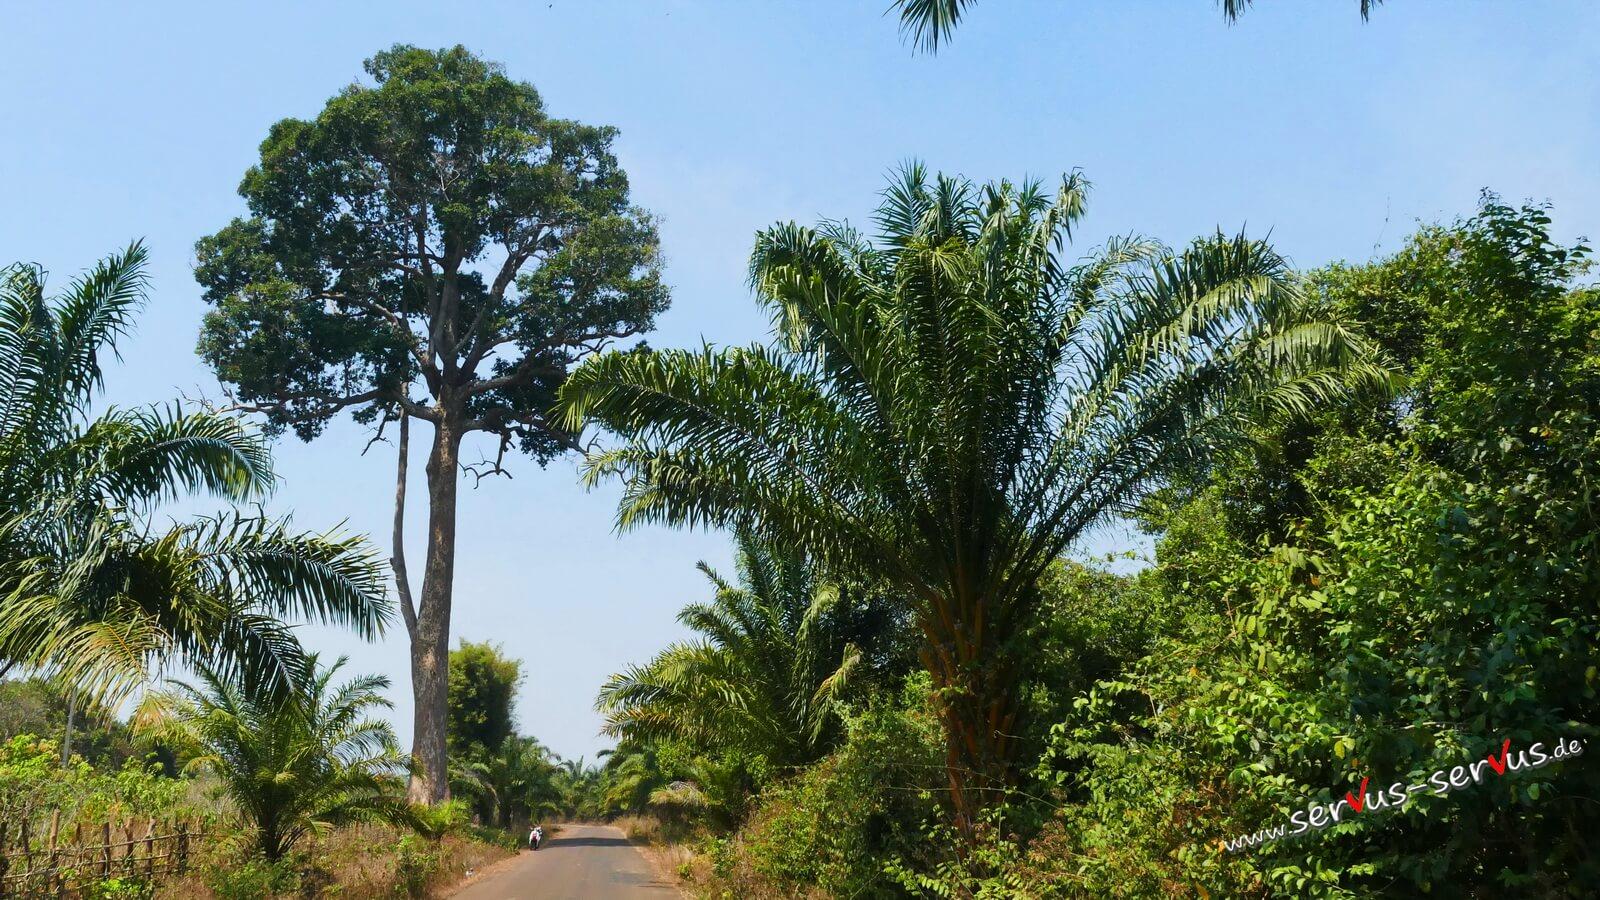 Baum, Dschungel, Baumriese, Laos, Bolavenplateau